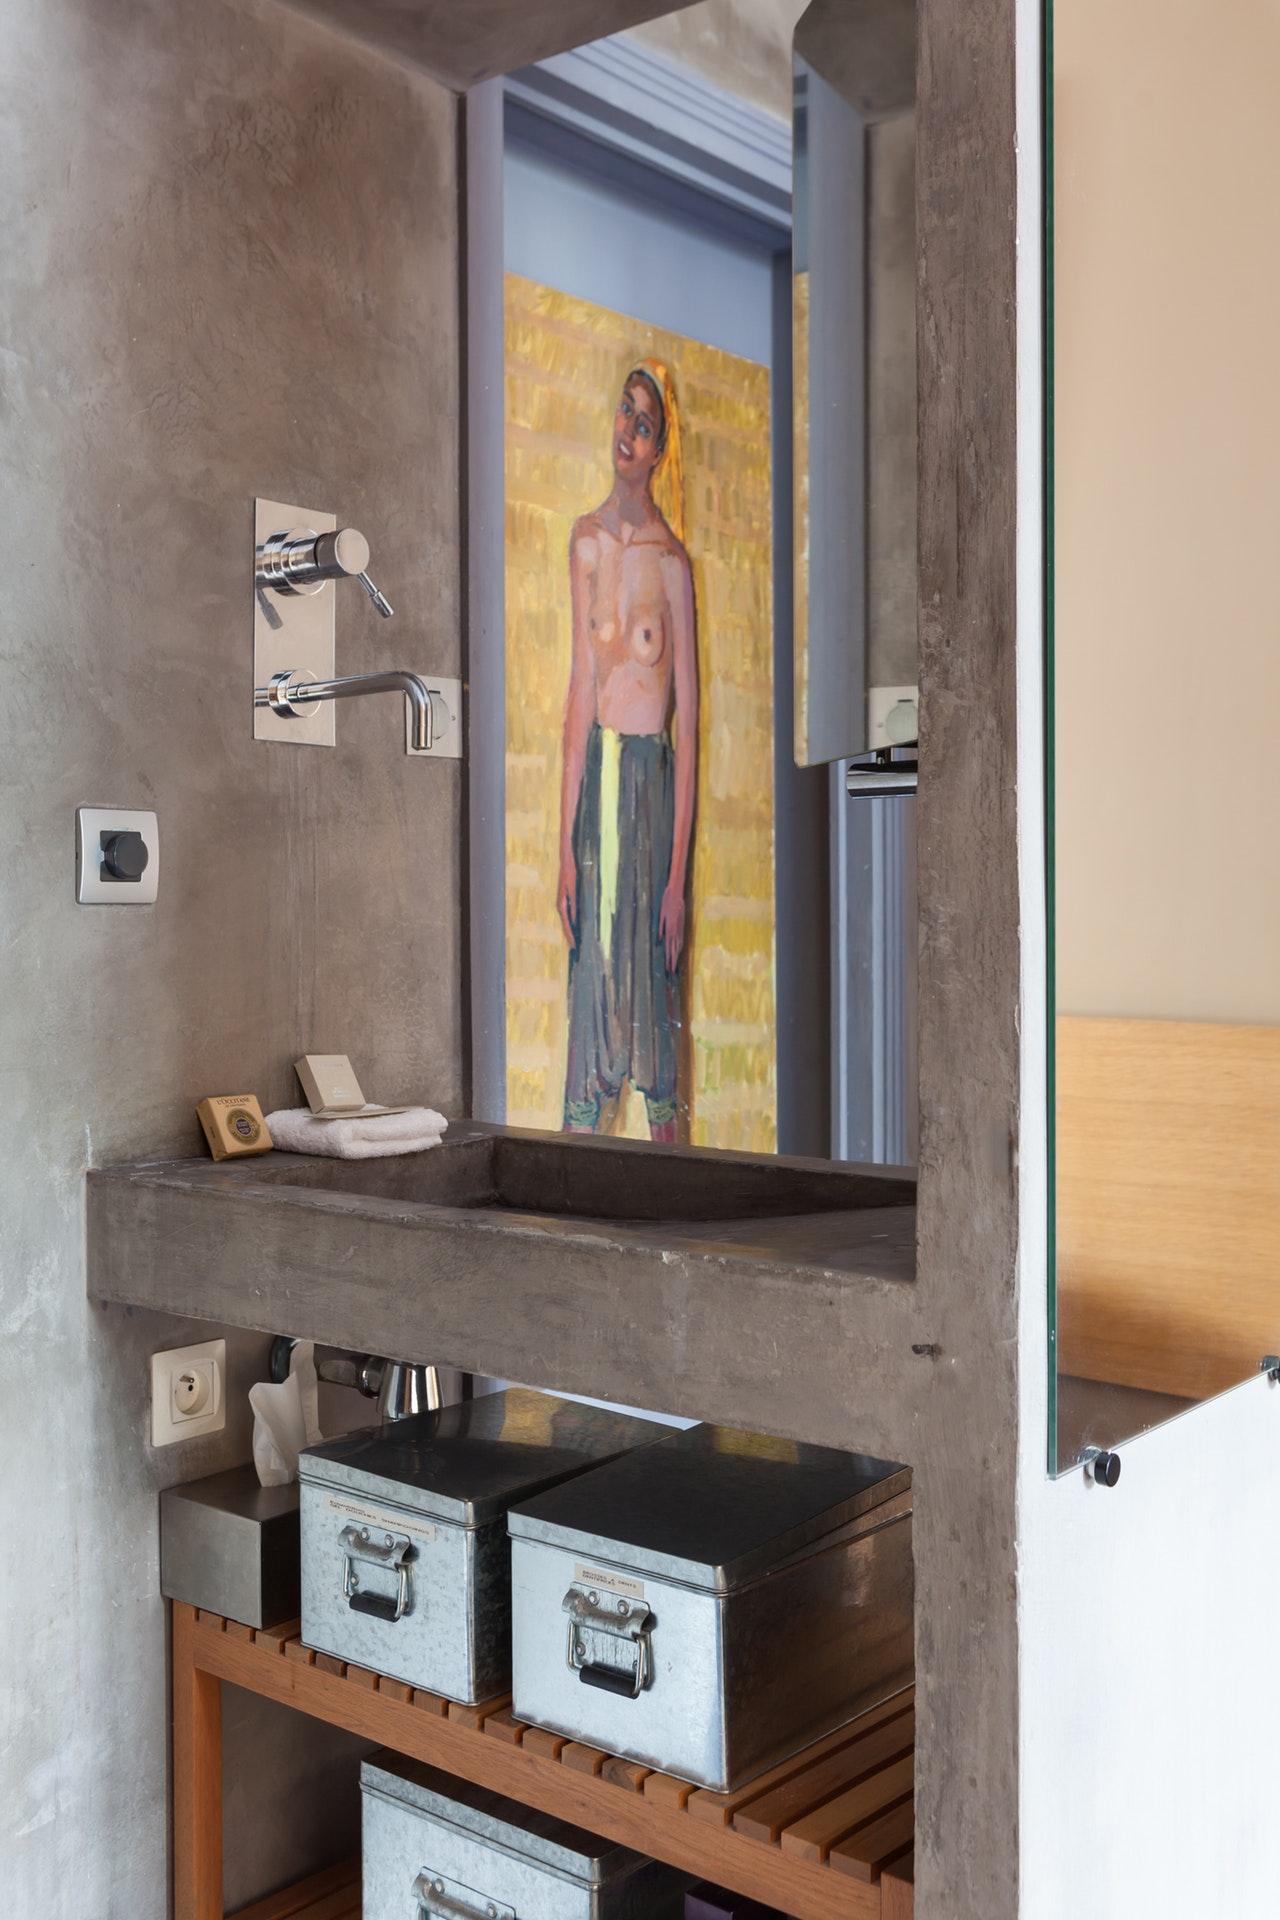 бетон раковина смеситель зеркало полки